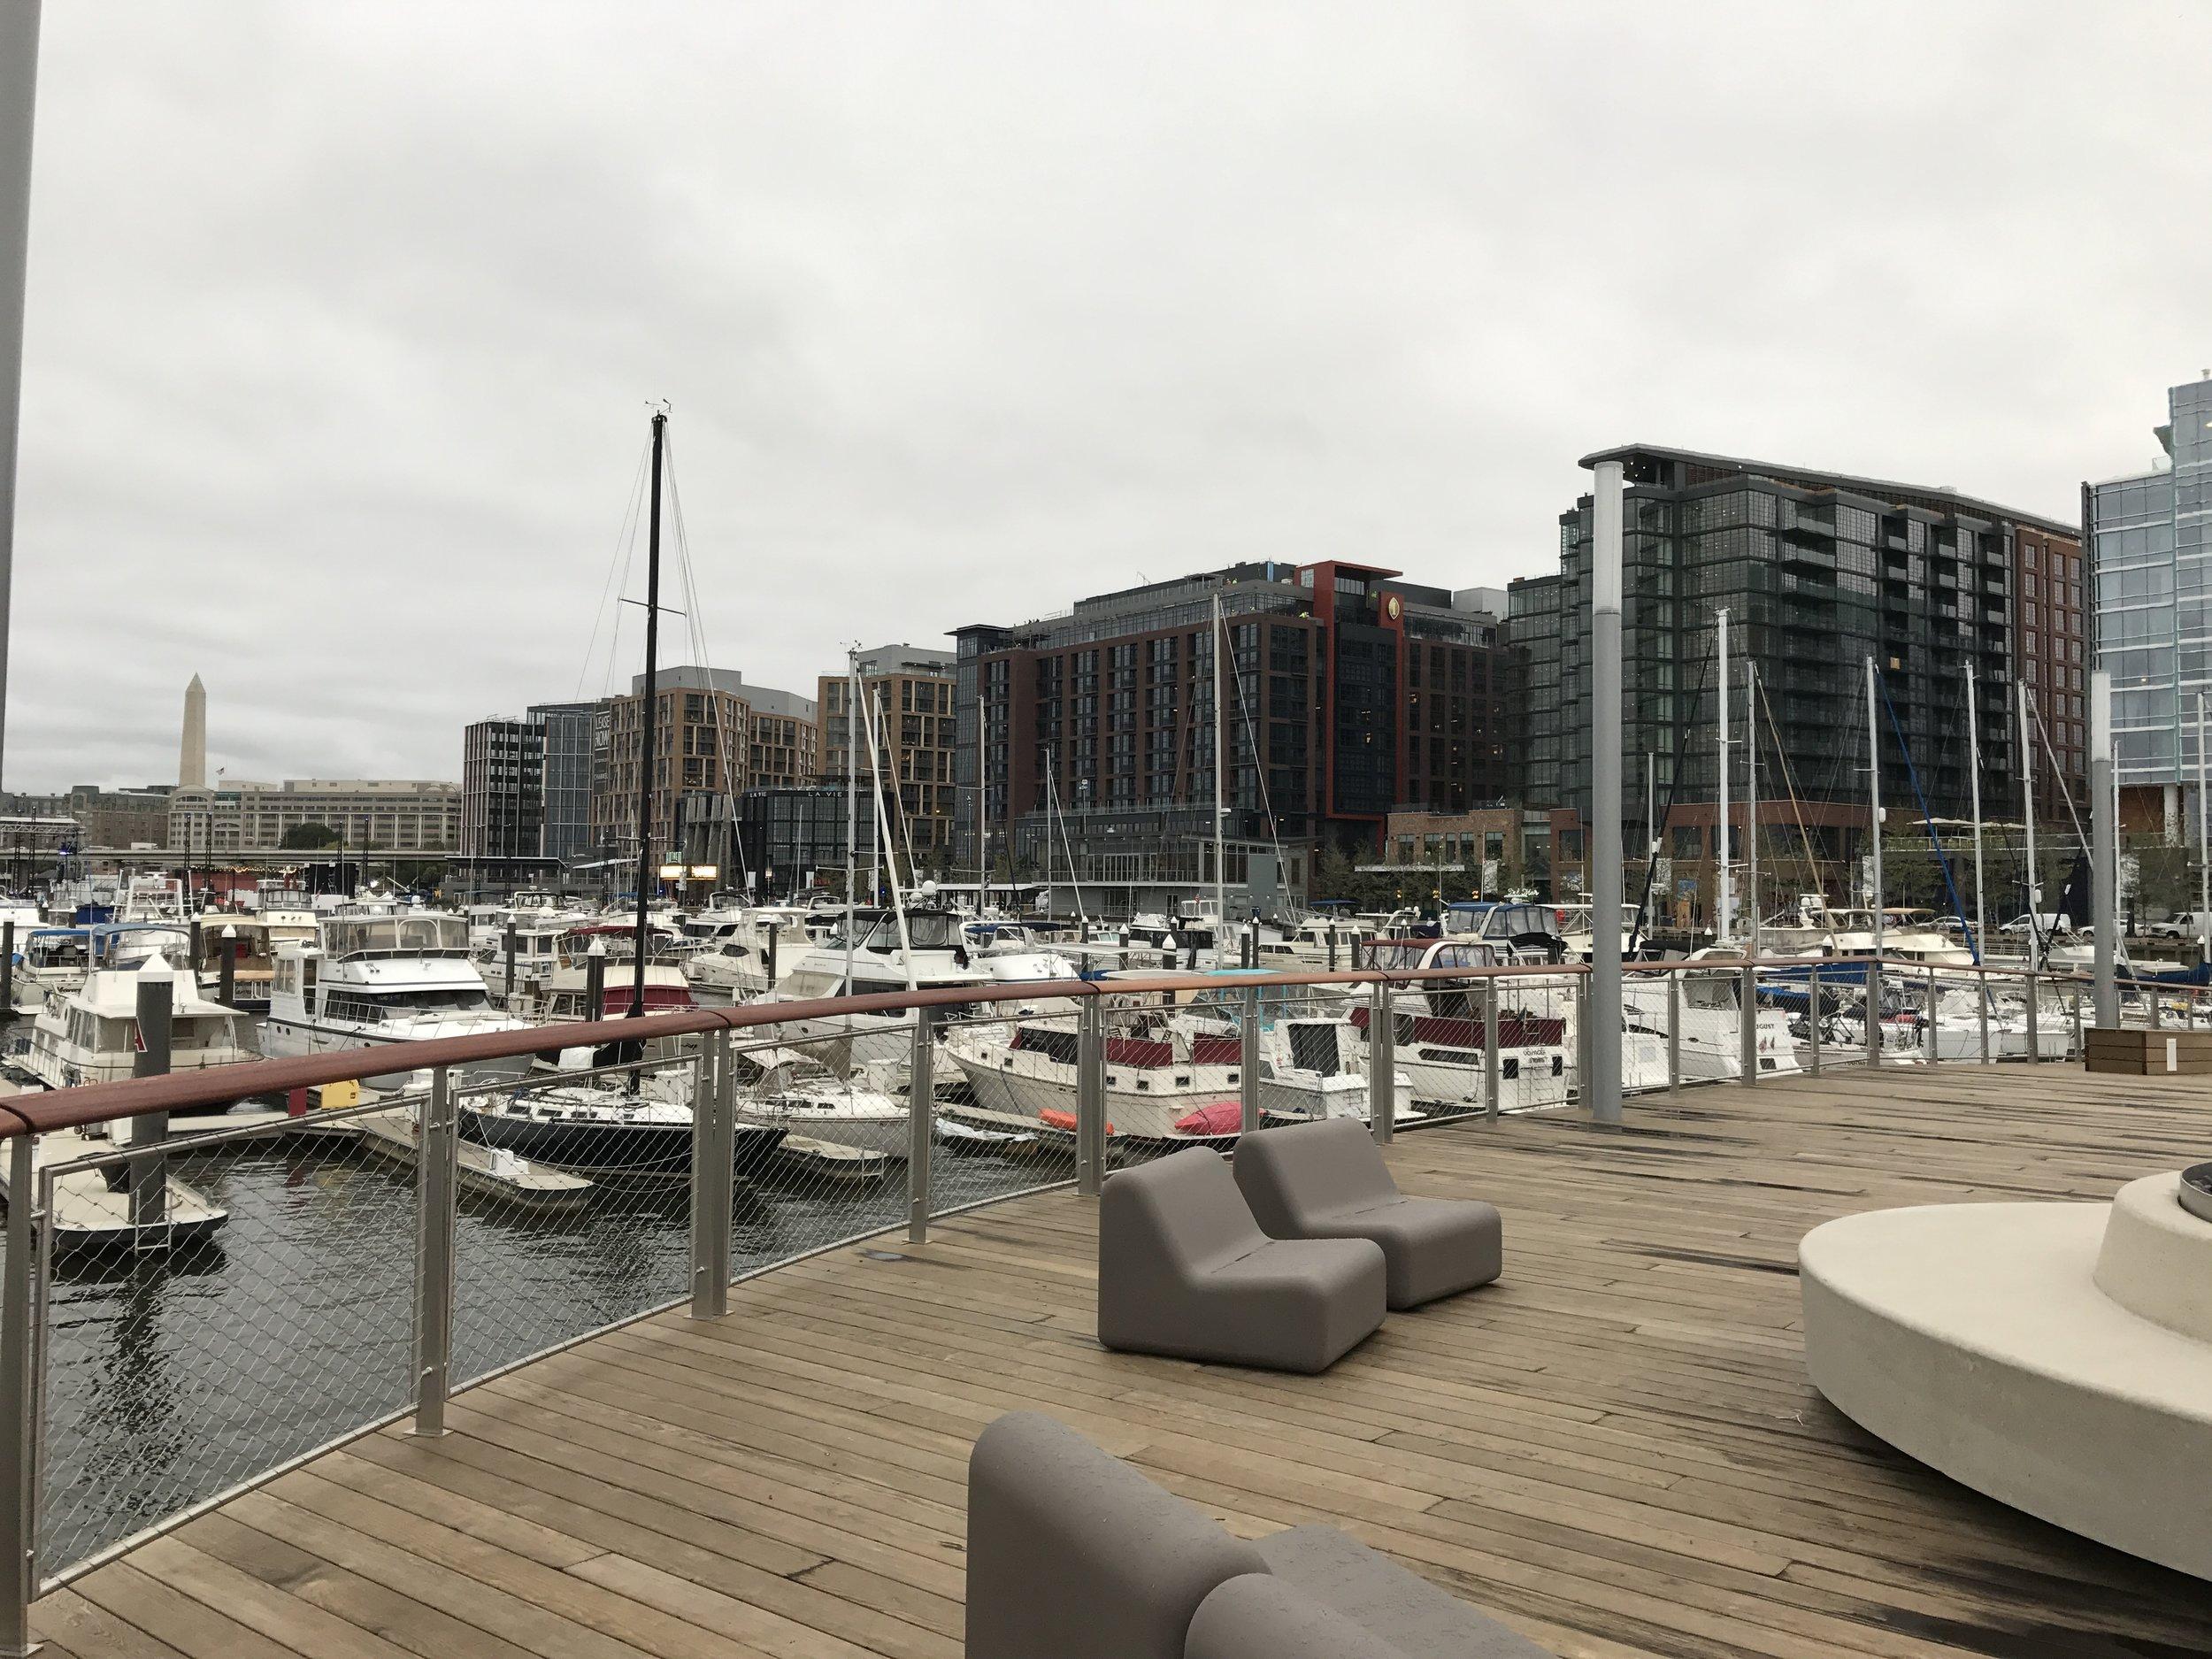 Southwest-Waterfront-Boats.jpg